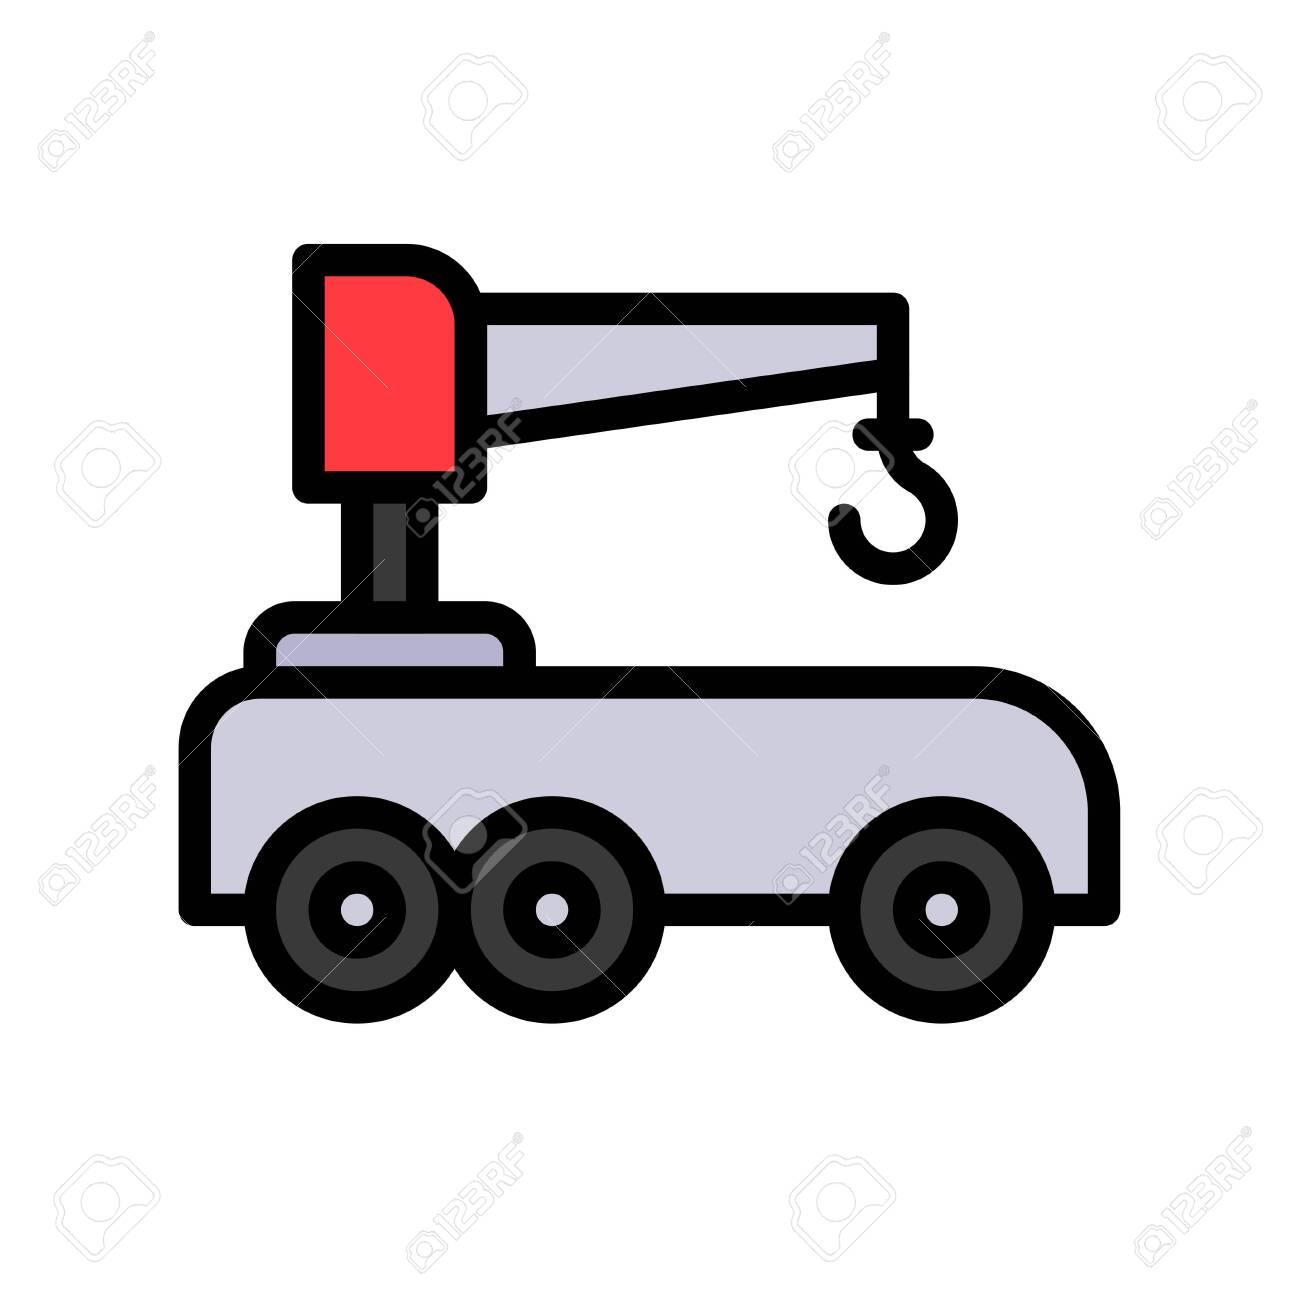 Robotic car vector illustration, Future technology filled design icon - 136139972